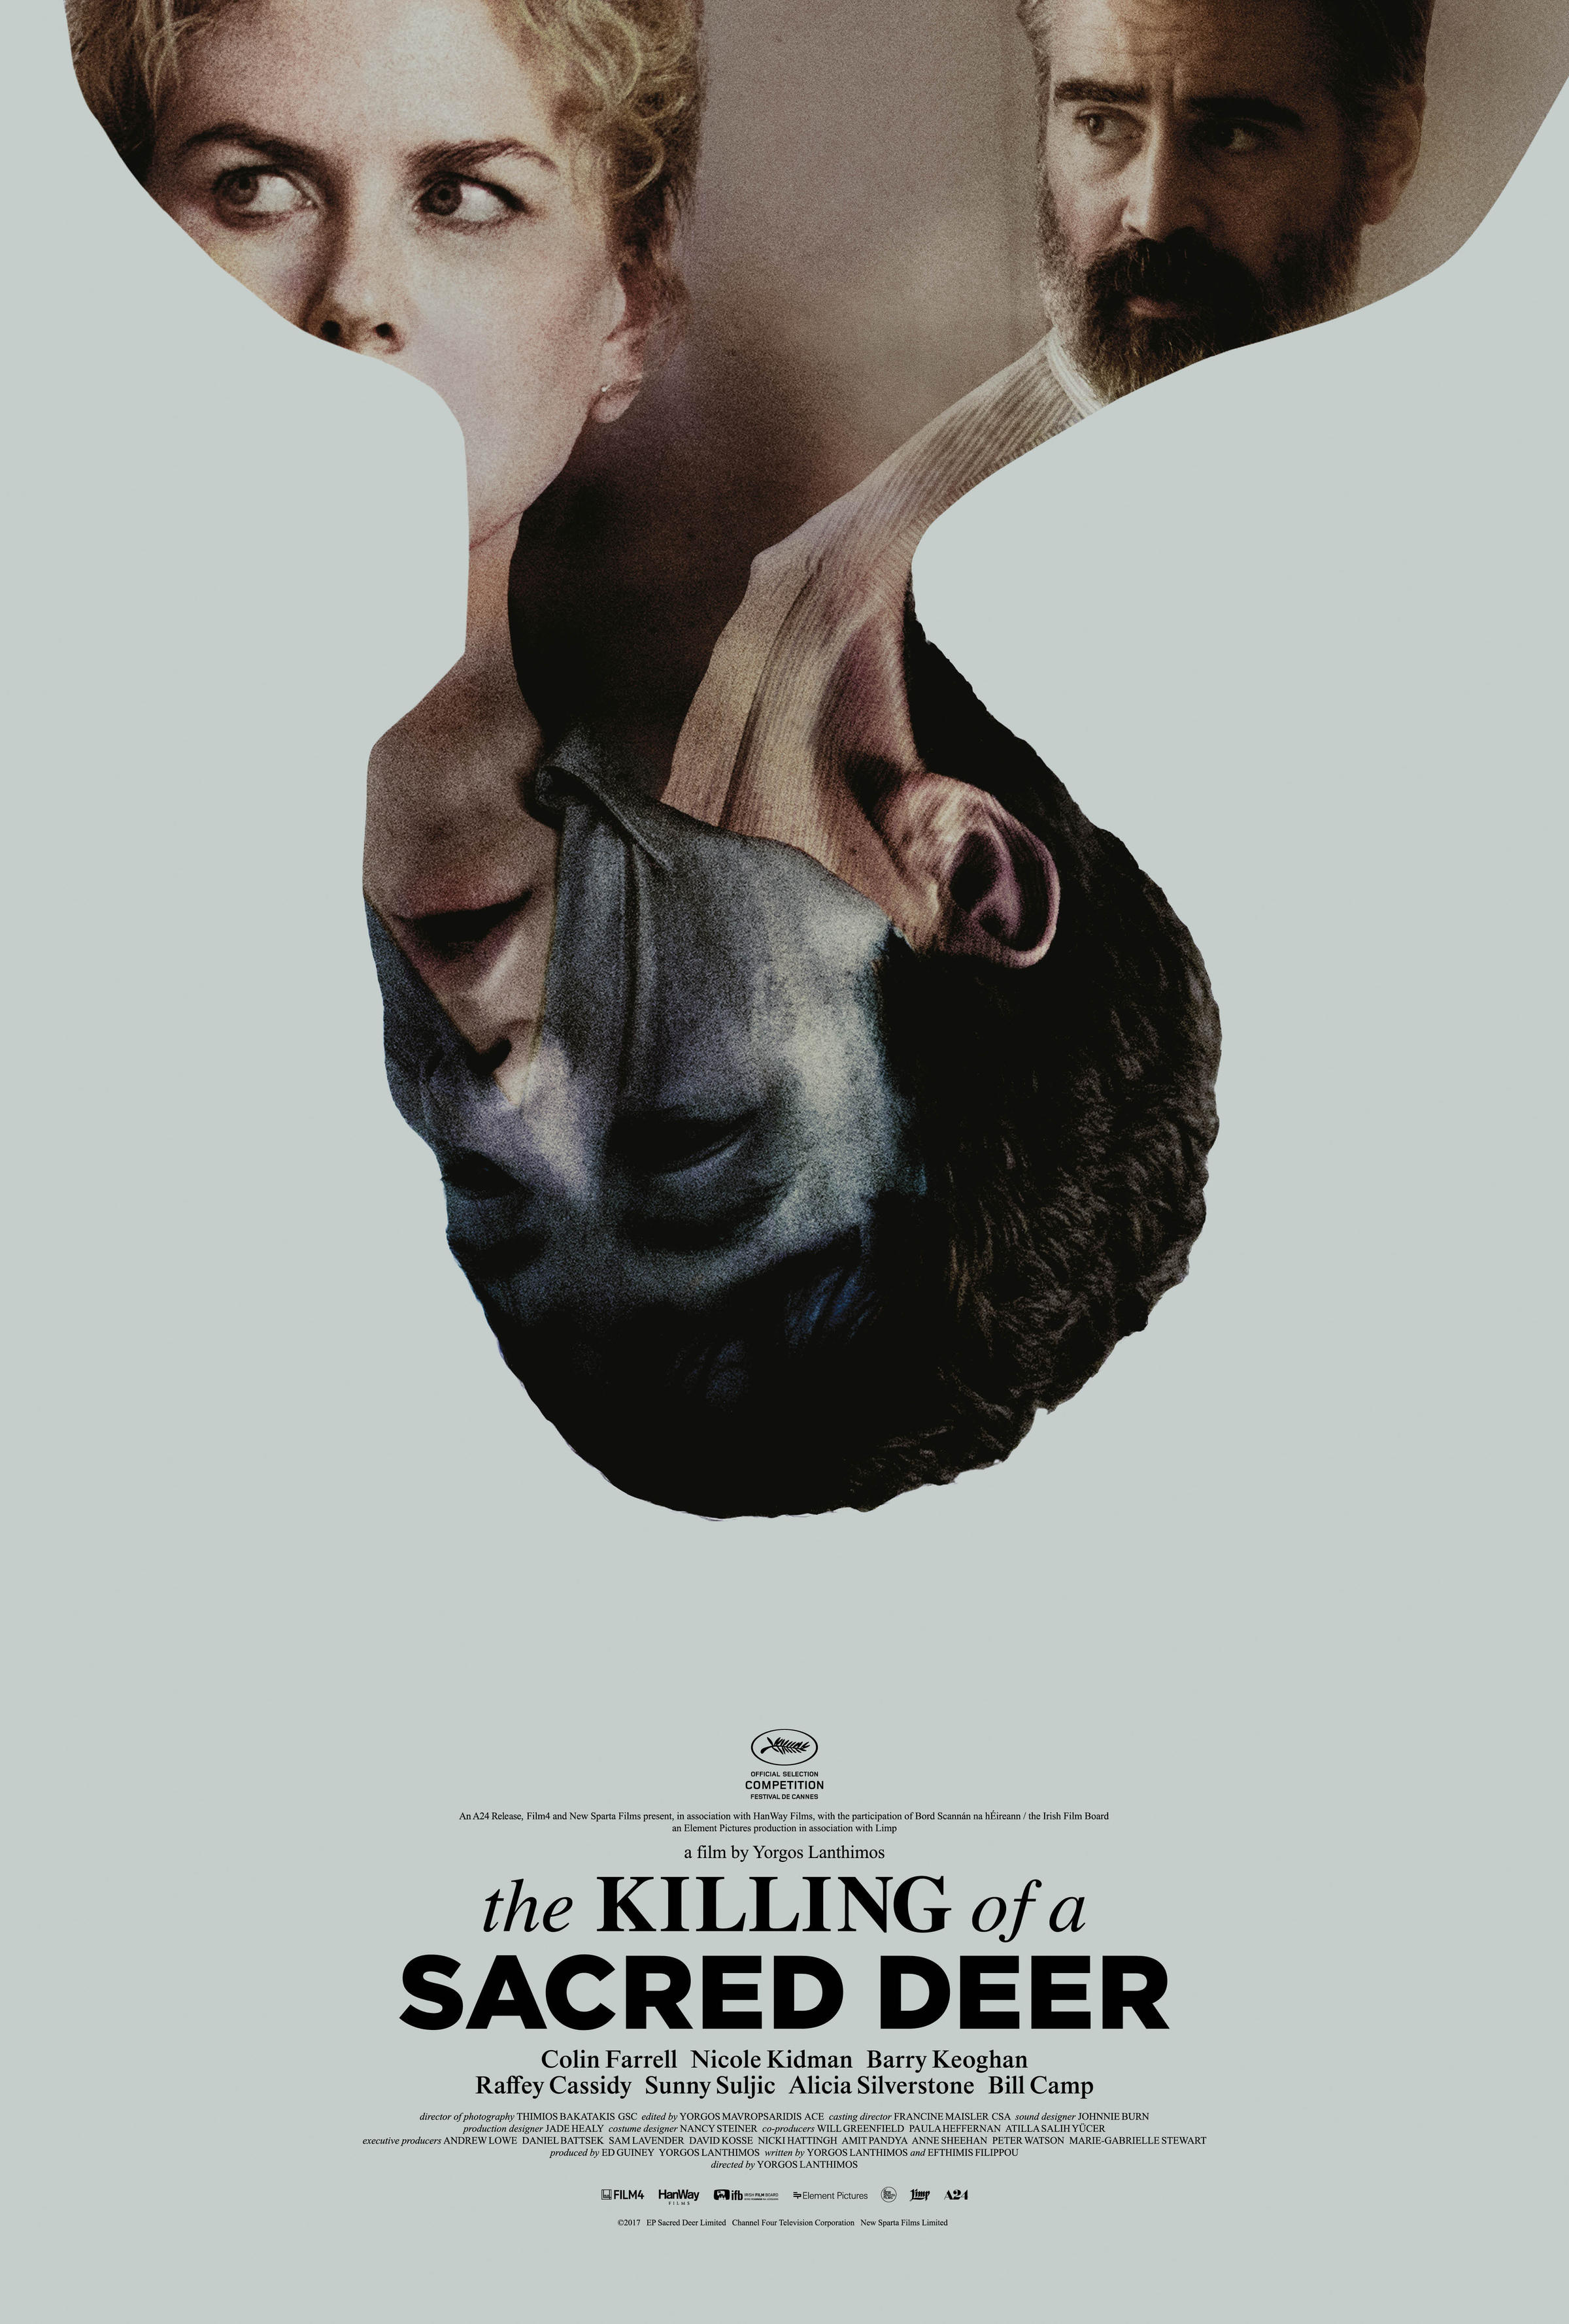 the_killing_of_a_sacred_deer_poster_.jpg